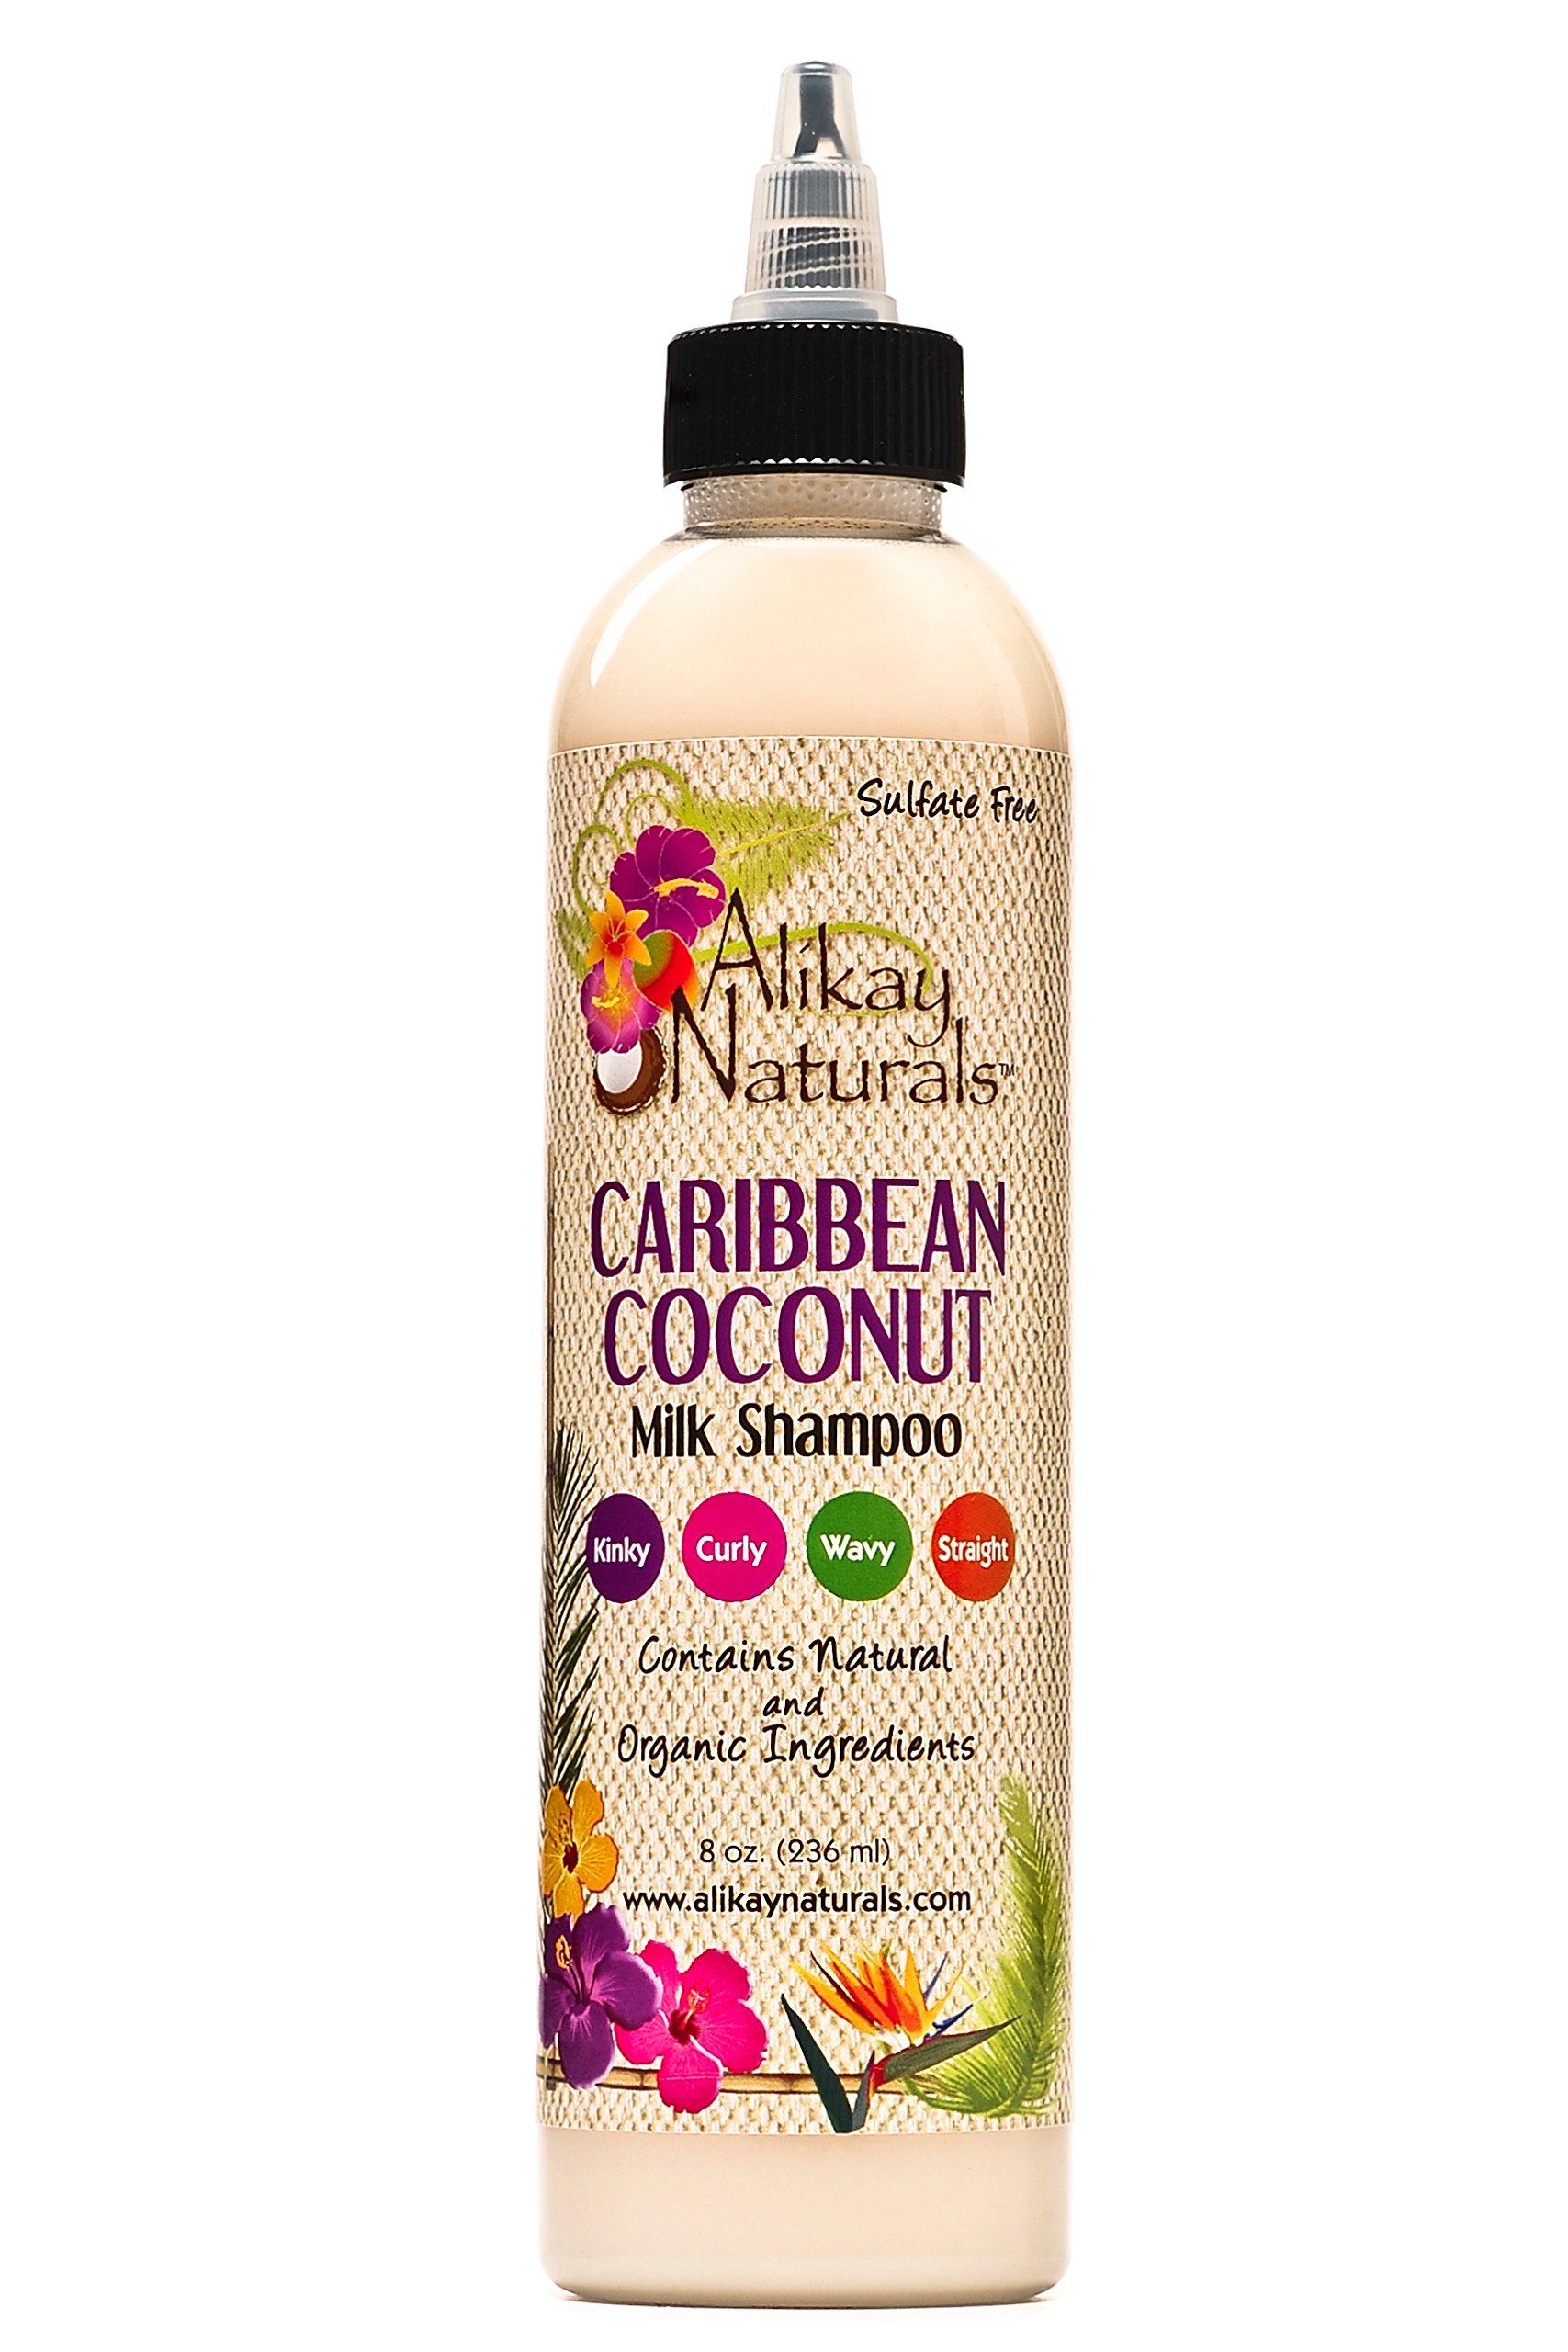 Alikay Naturals - Caribbean Coconut Milk Shampoo 8oz